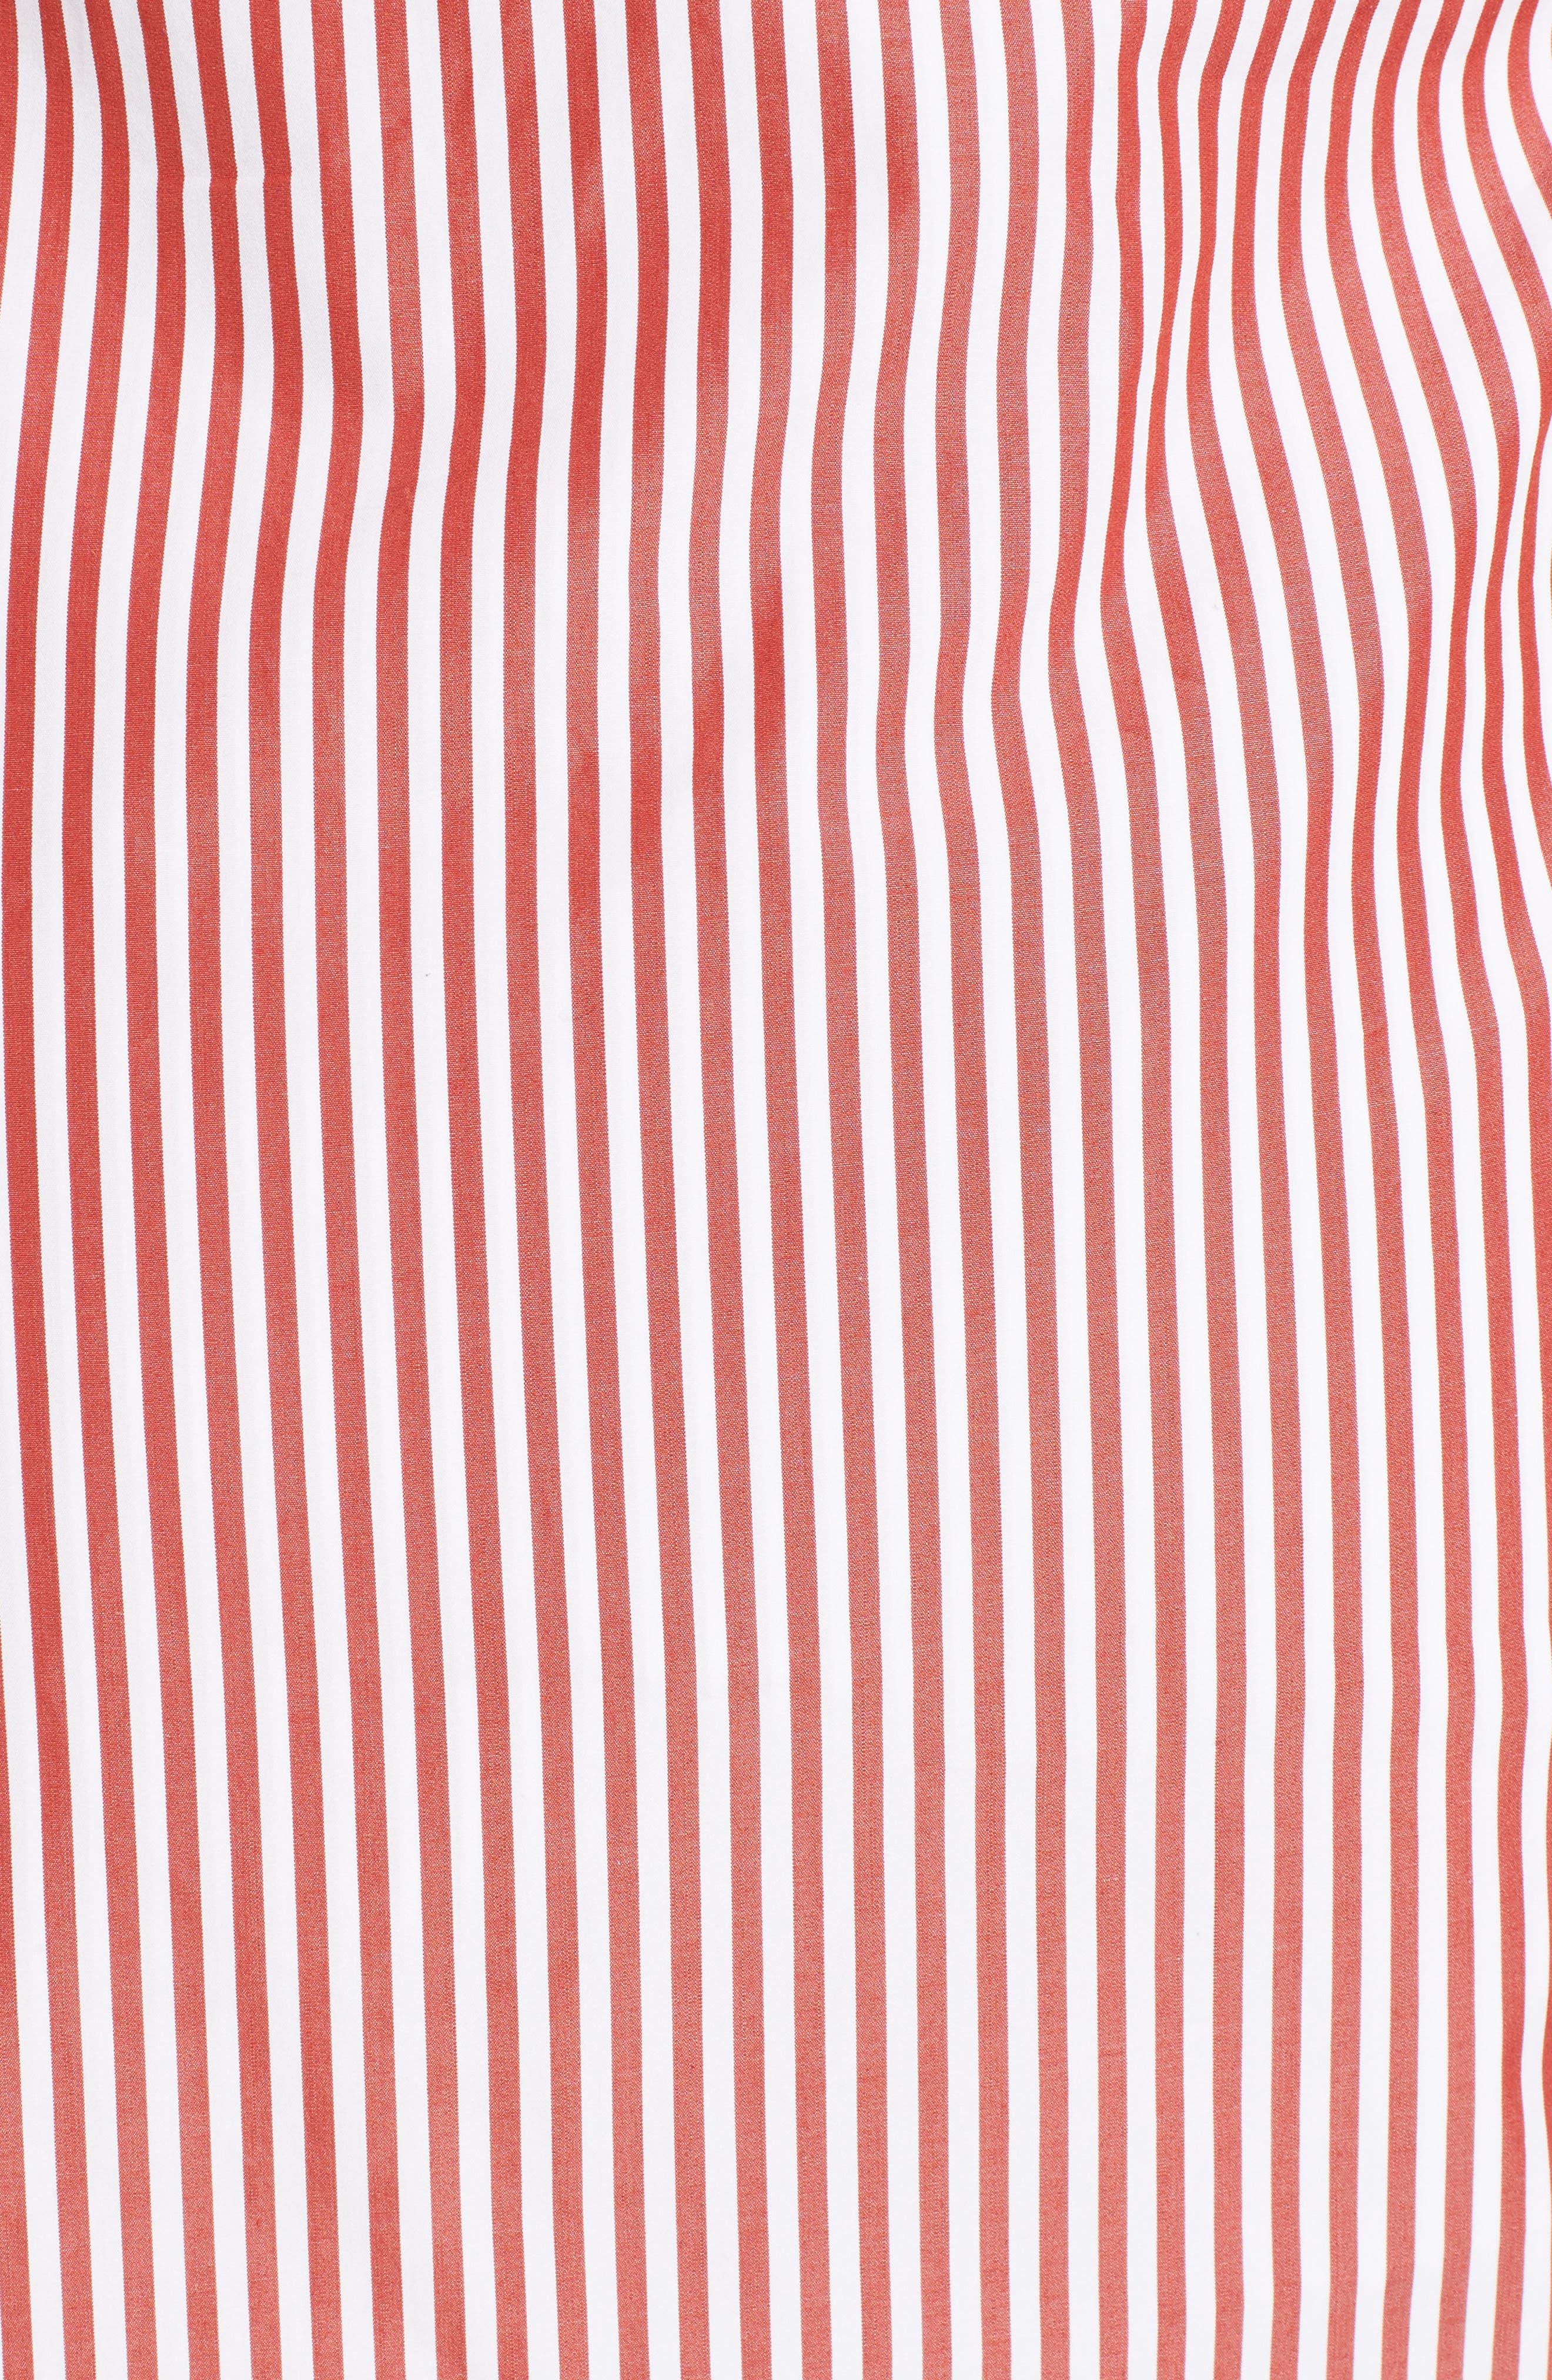 Stripe Wrap Tie Shirt,                             Alternate thumbnail 5, color,